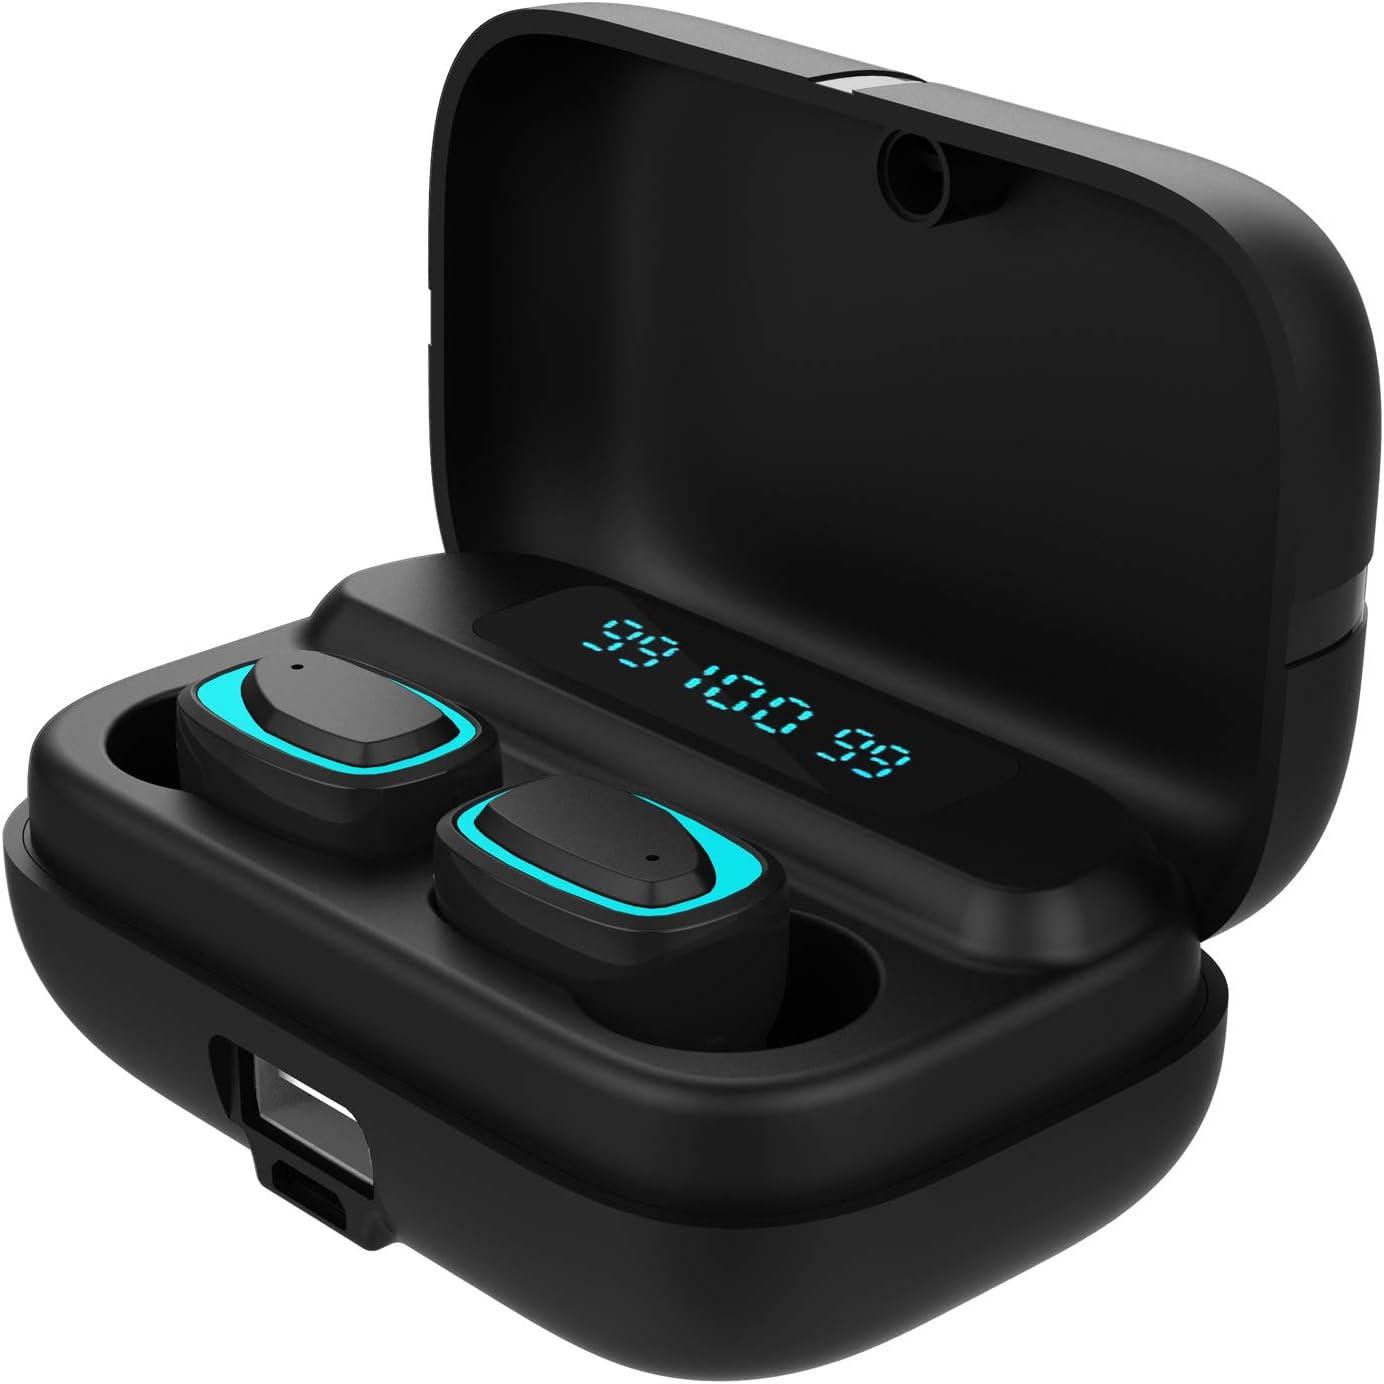 True Wireless Earbuds-QANGEL Mini Bluetooth Headphones TWS Stereo in-Ear Earphones Sweatproof Sport Headsets with Mic Charging Case,LED Digital Display, Smart Touch Control,Deep Bass,Bluetooth 5.0